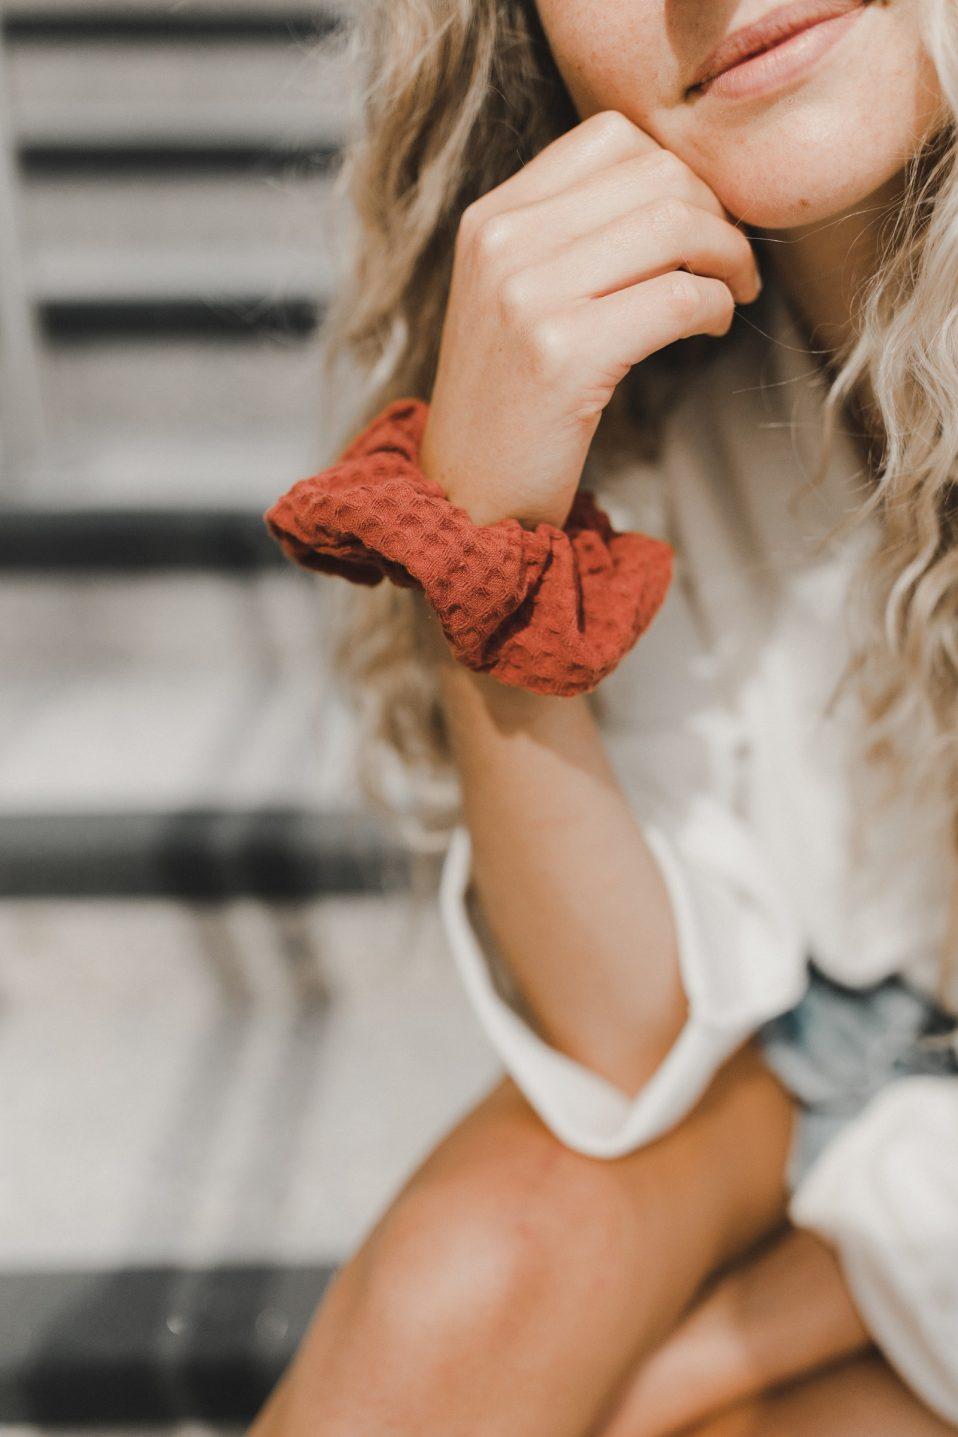 woman with burnt orange scrunchie on wrist